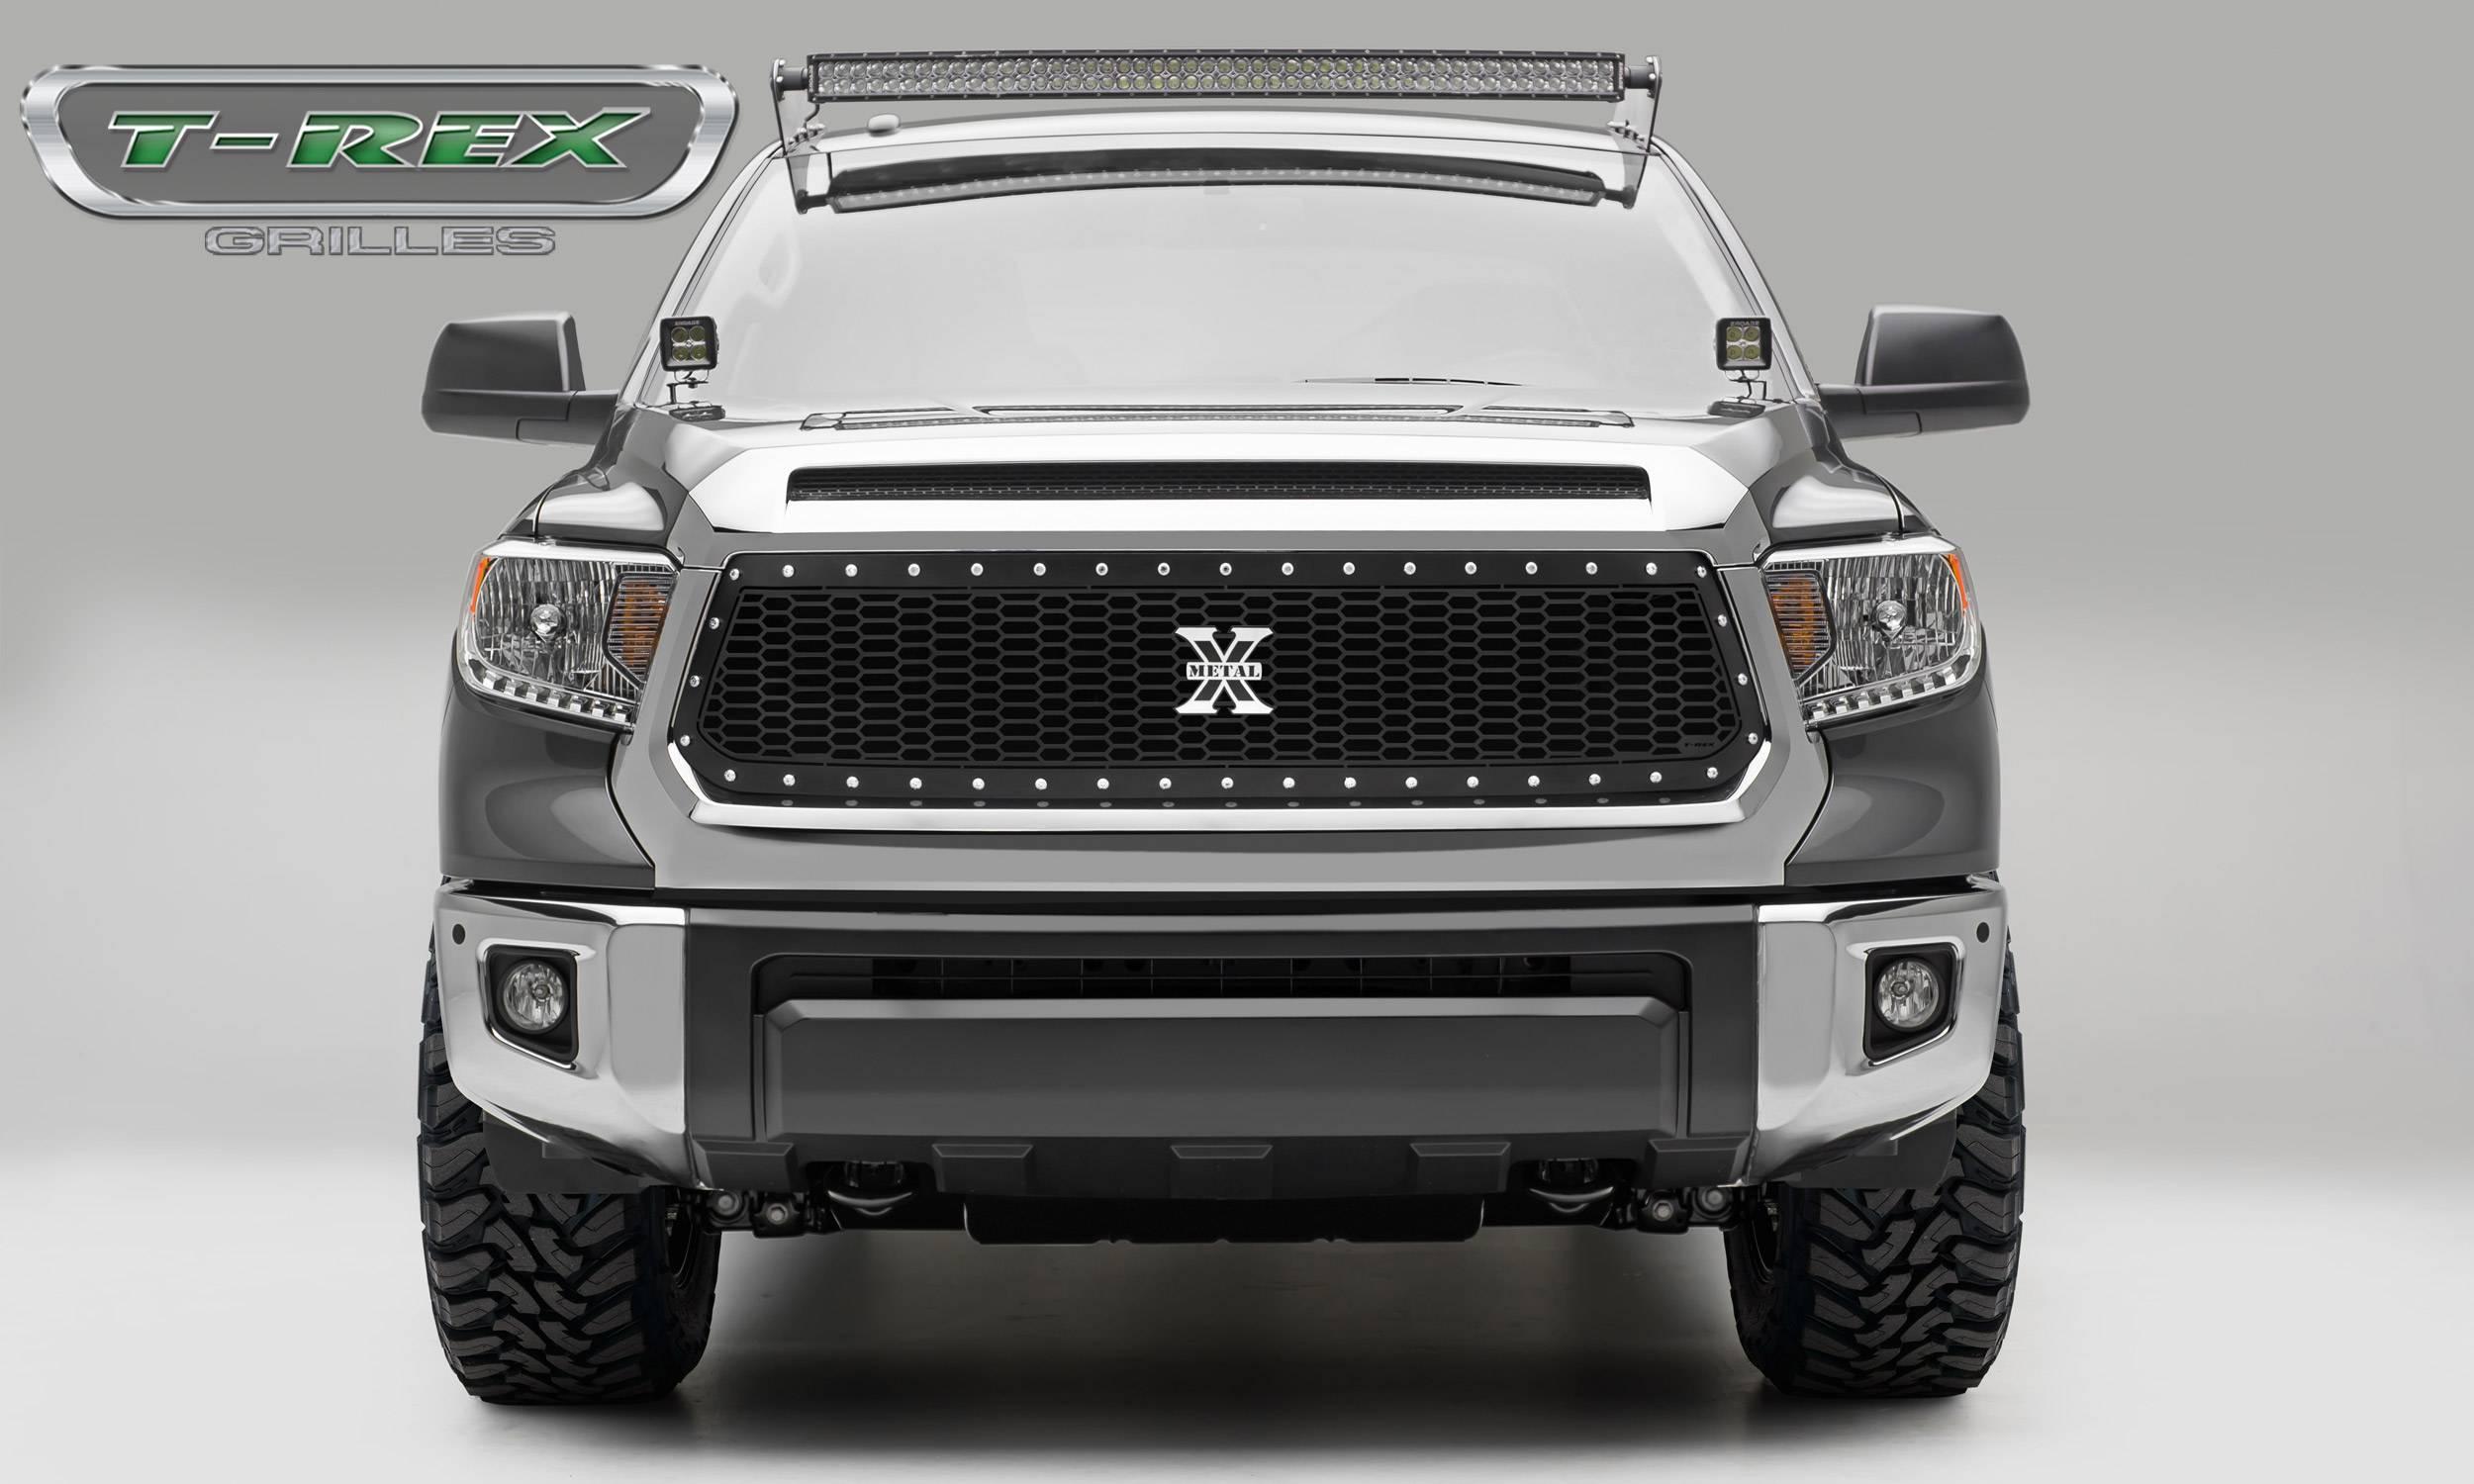 T-REX Grilles - 2014-2017 Tundra Laser X Grille, Black, 1 Pc, Replacement, Chrome Studs - PN #7719641